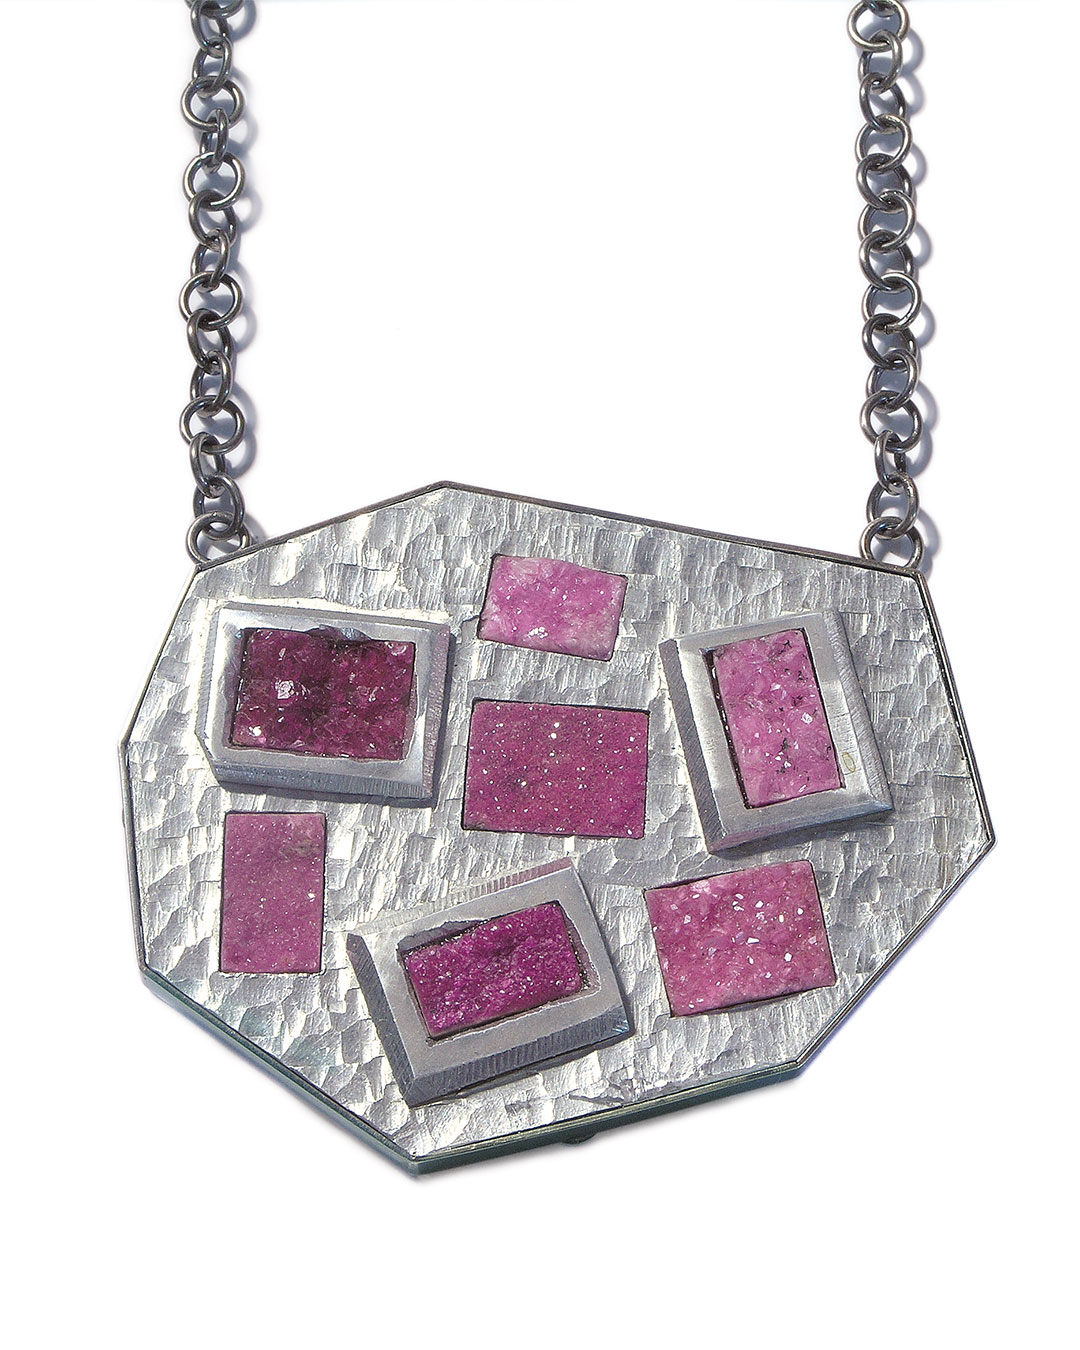 Sybille Richter, Heide (Heath), 2009, necklace; aluminium, 935 silver, calcite, 75 x 60 x 7 mm, €970